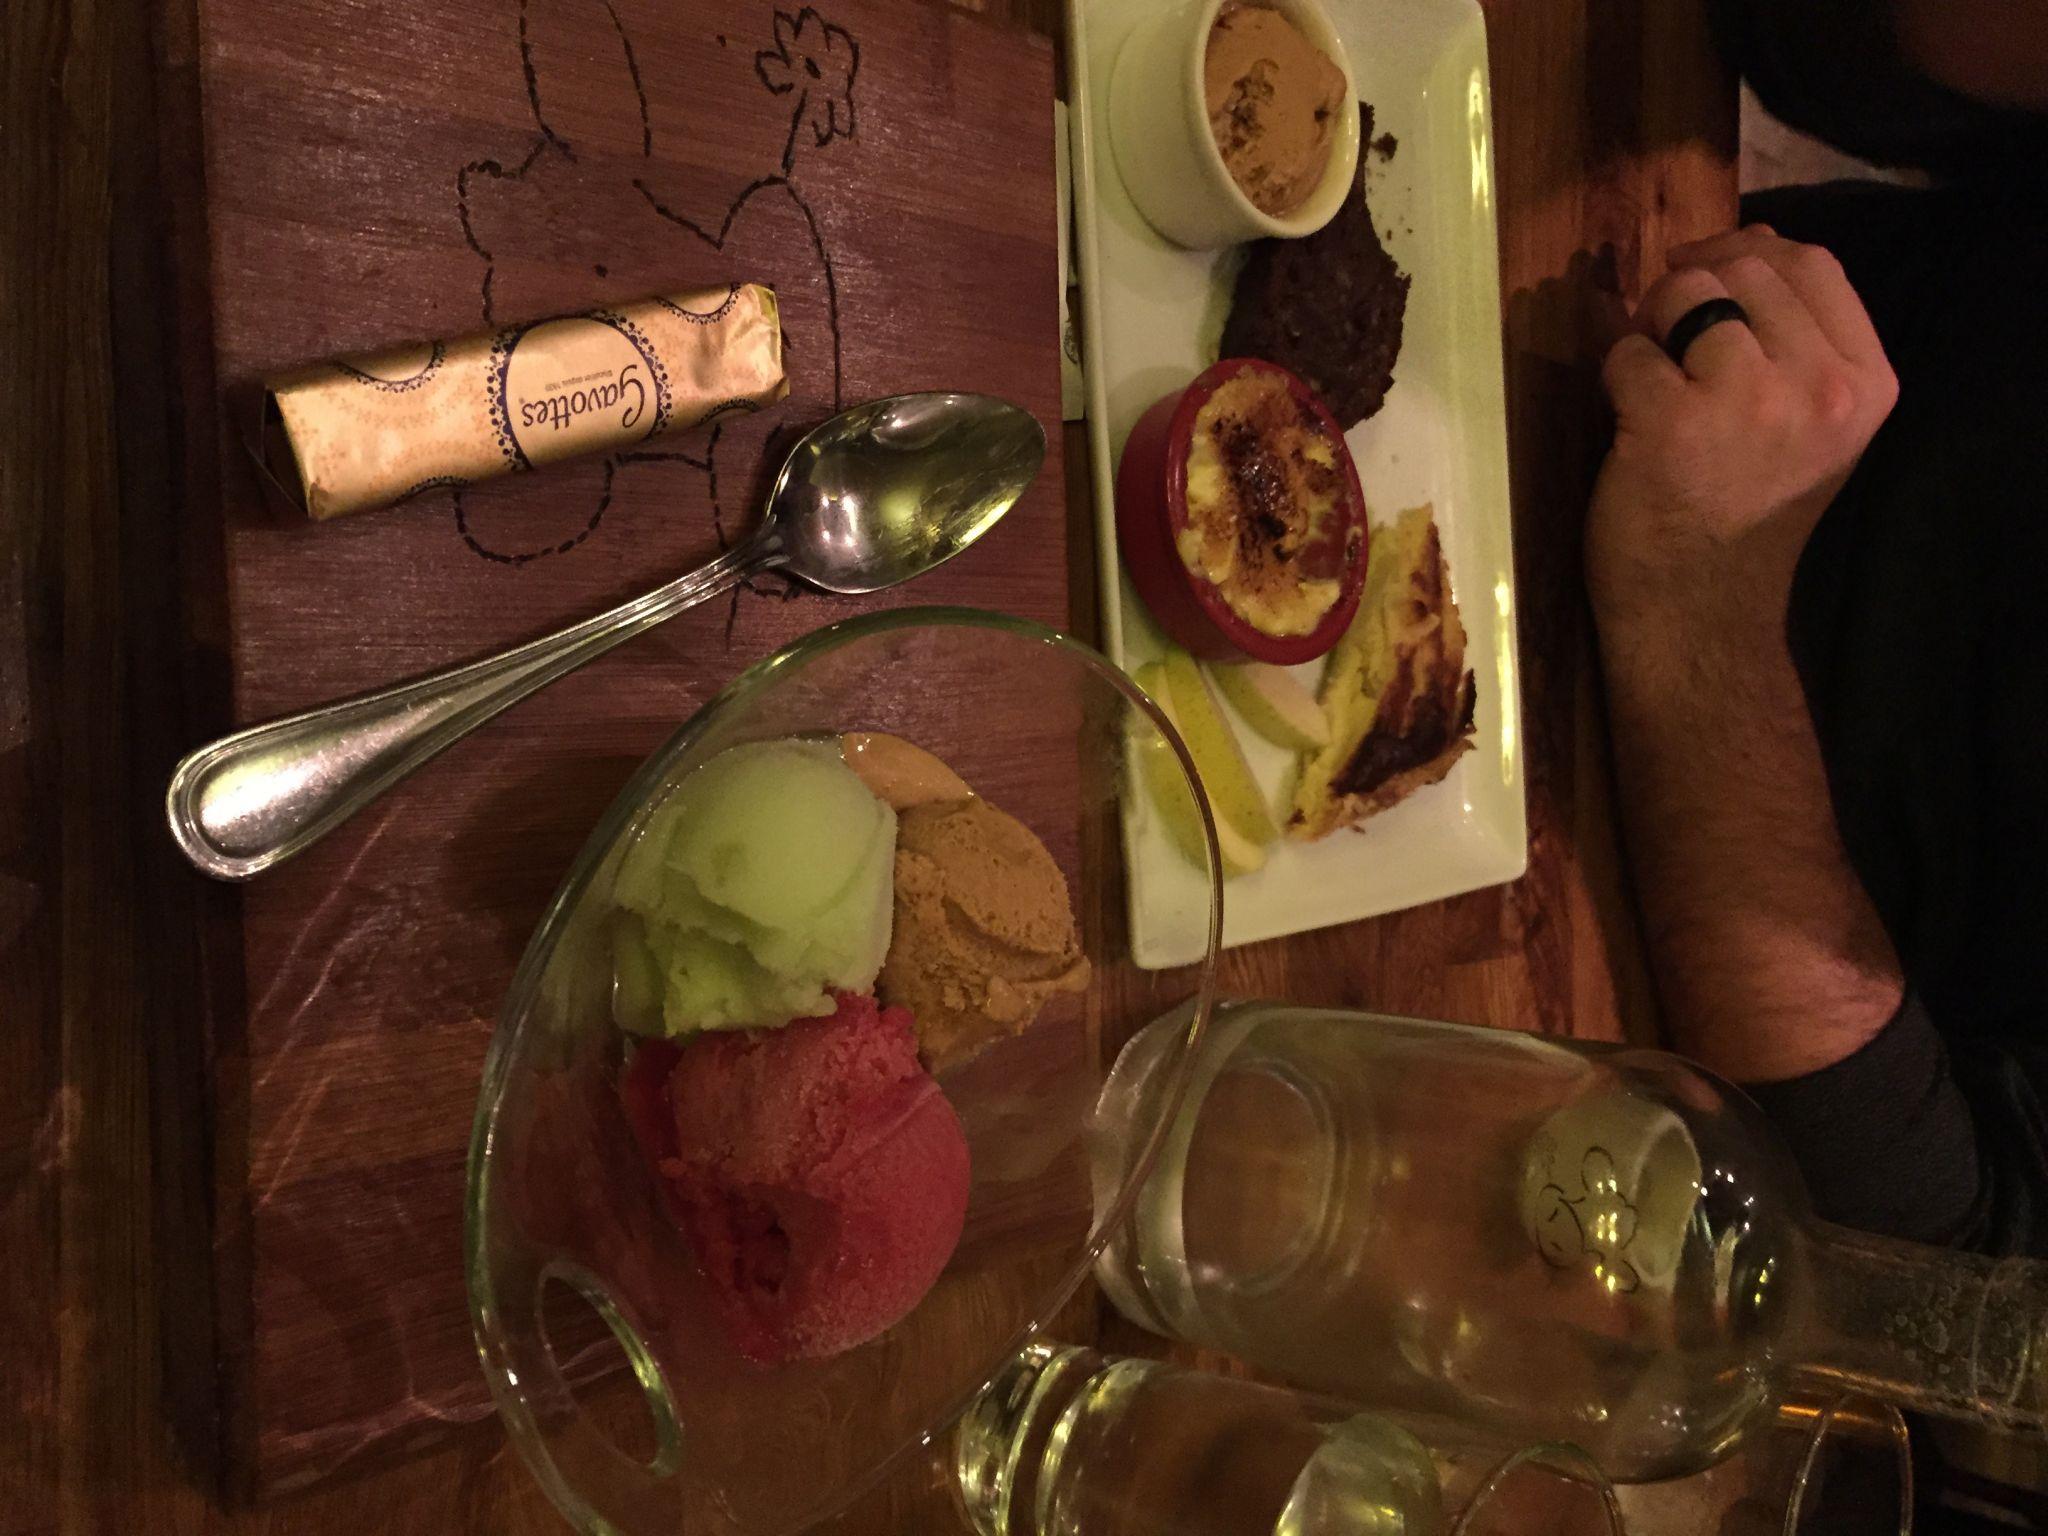 Sacree Fleur dessert Paris